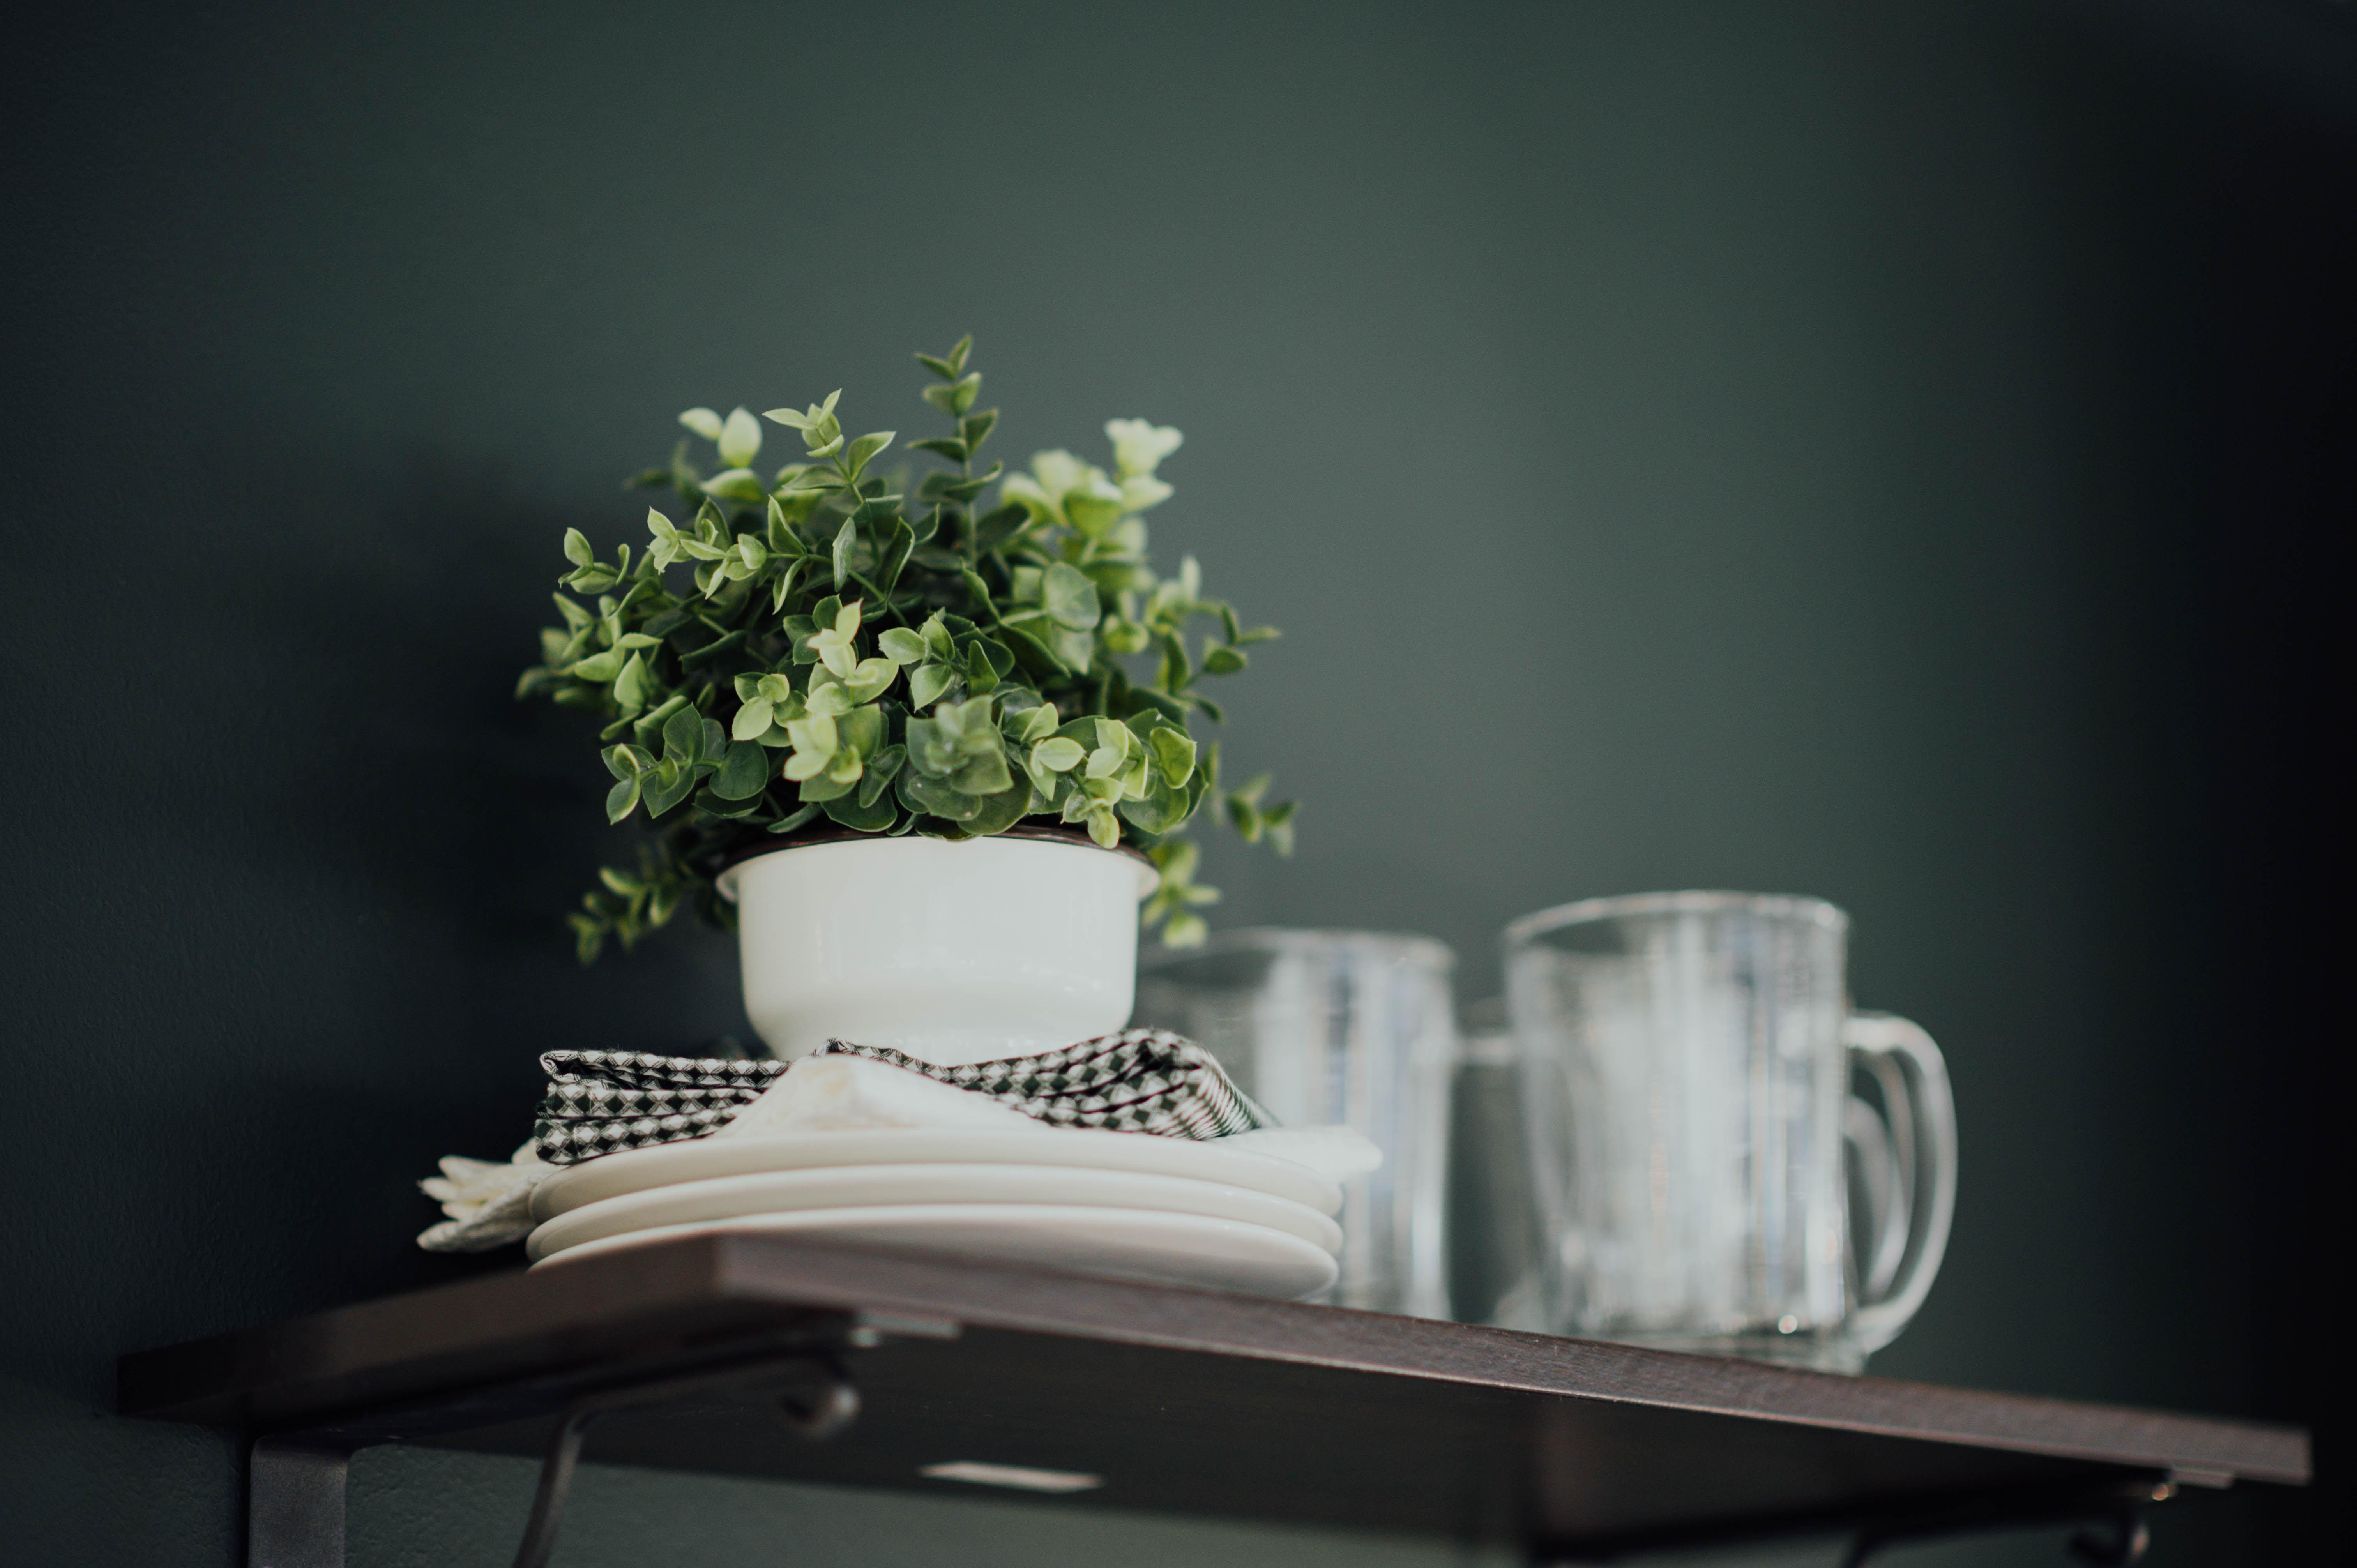 green plant on pot